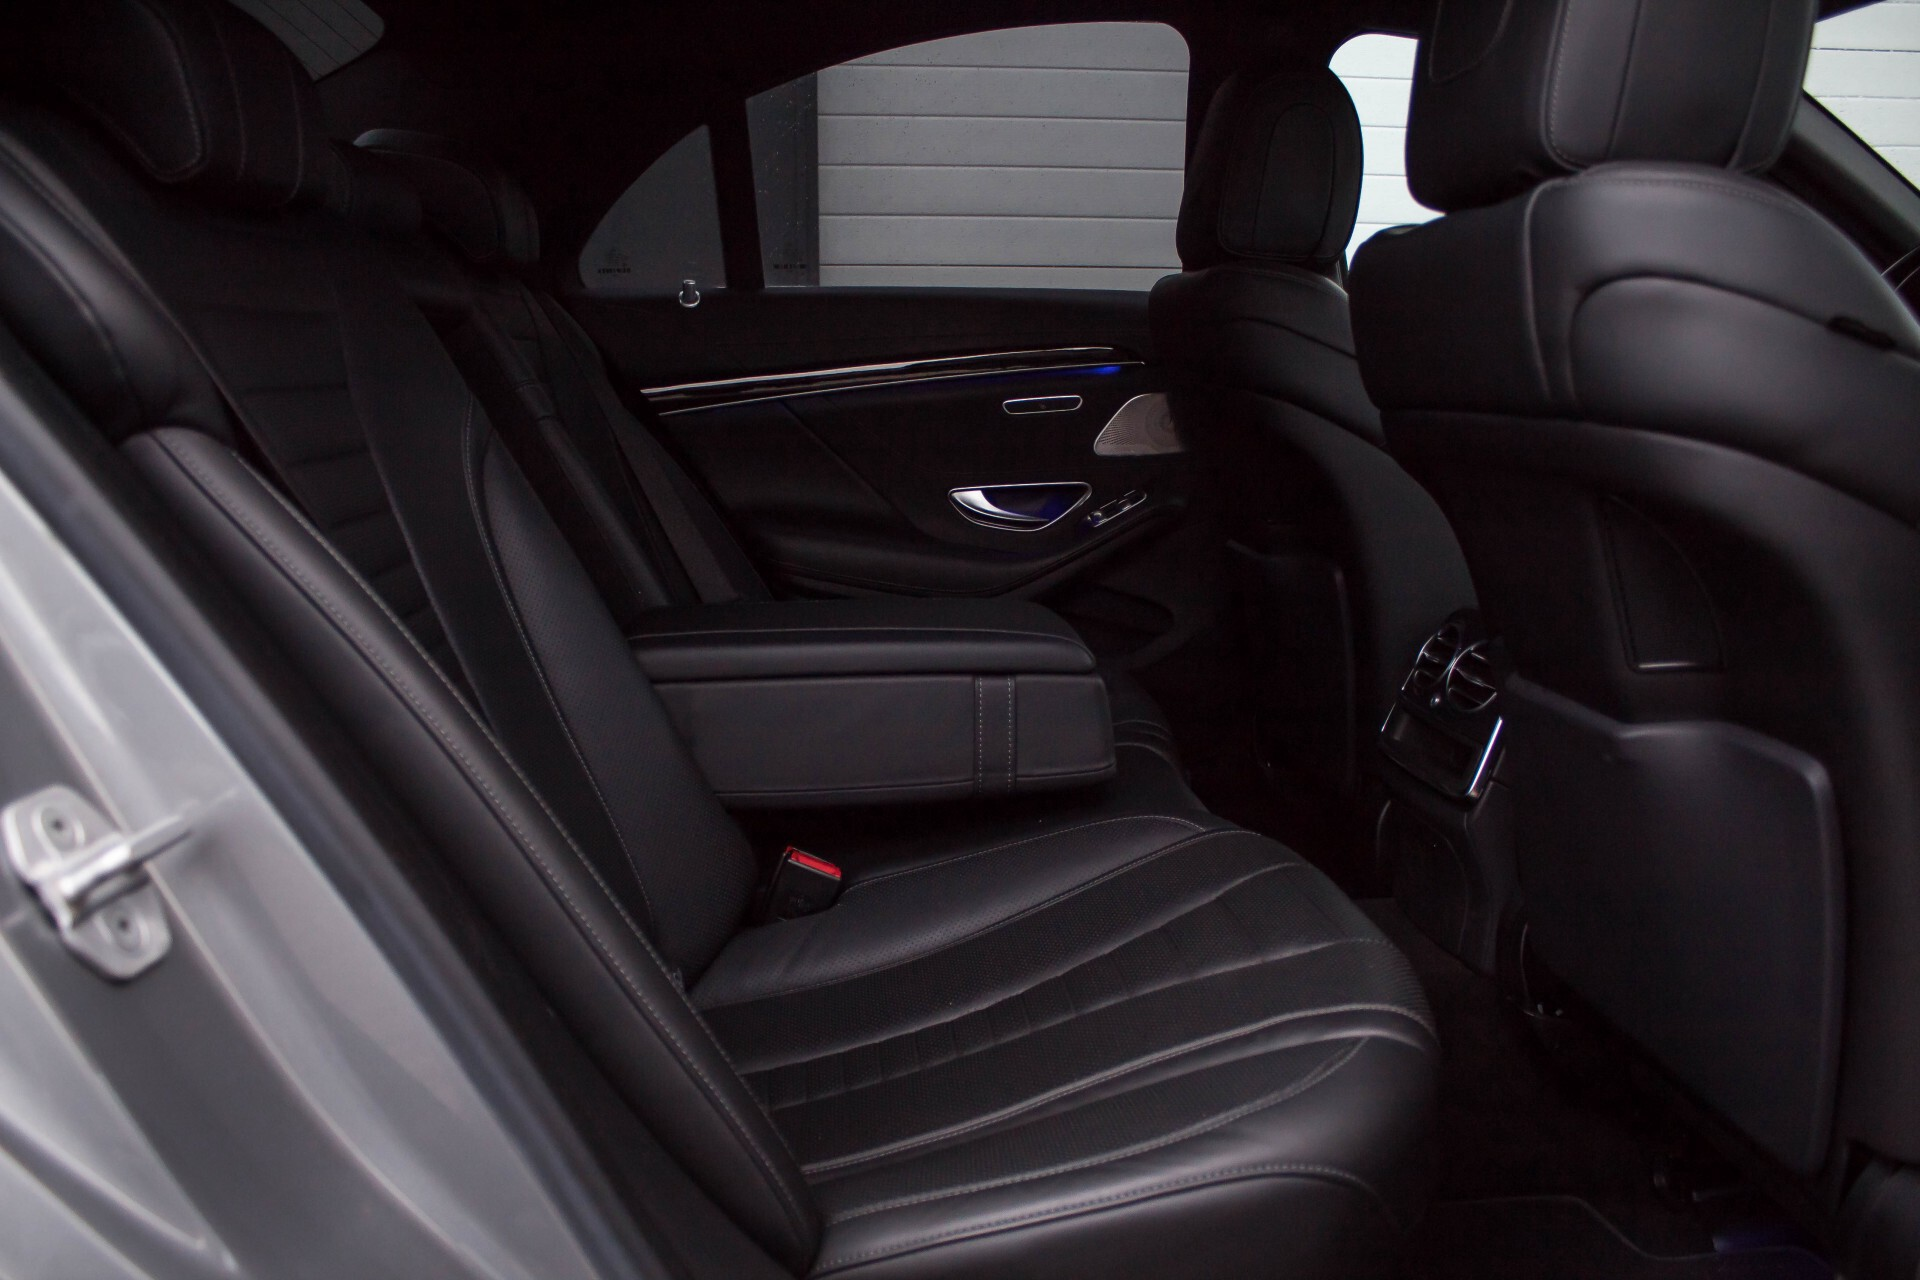 Mercedes-Benz S-Klasse 350 BlueTEC 63 AMG Panorama/Distronic/Keyless/Massage/Burmester Aut7 Foto 5